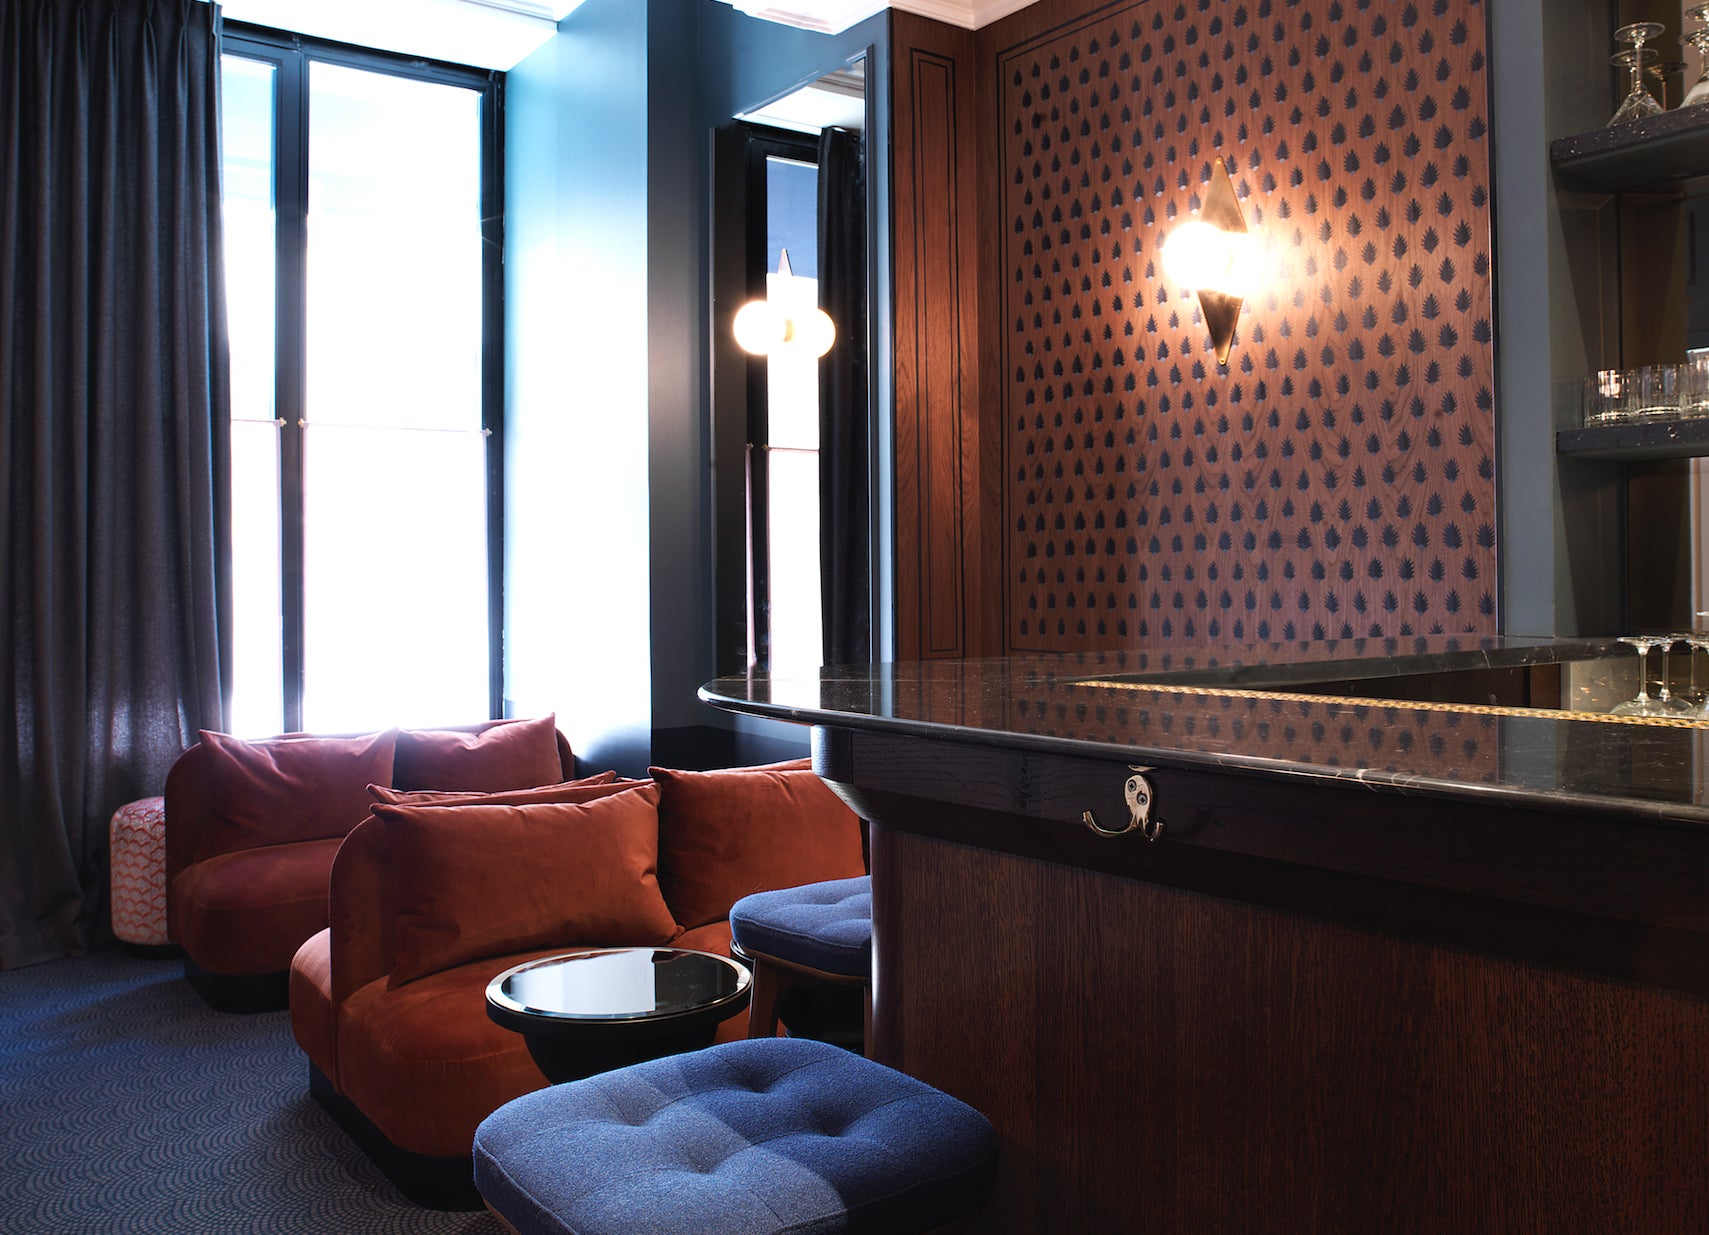 le bachaumont restaurant by chzon. Black Bedroom Furniture Sets. Home Design Ideas